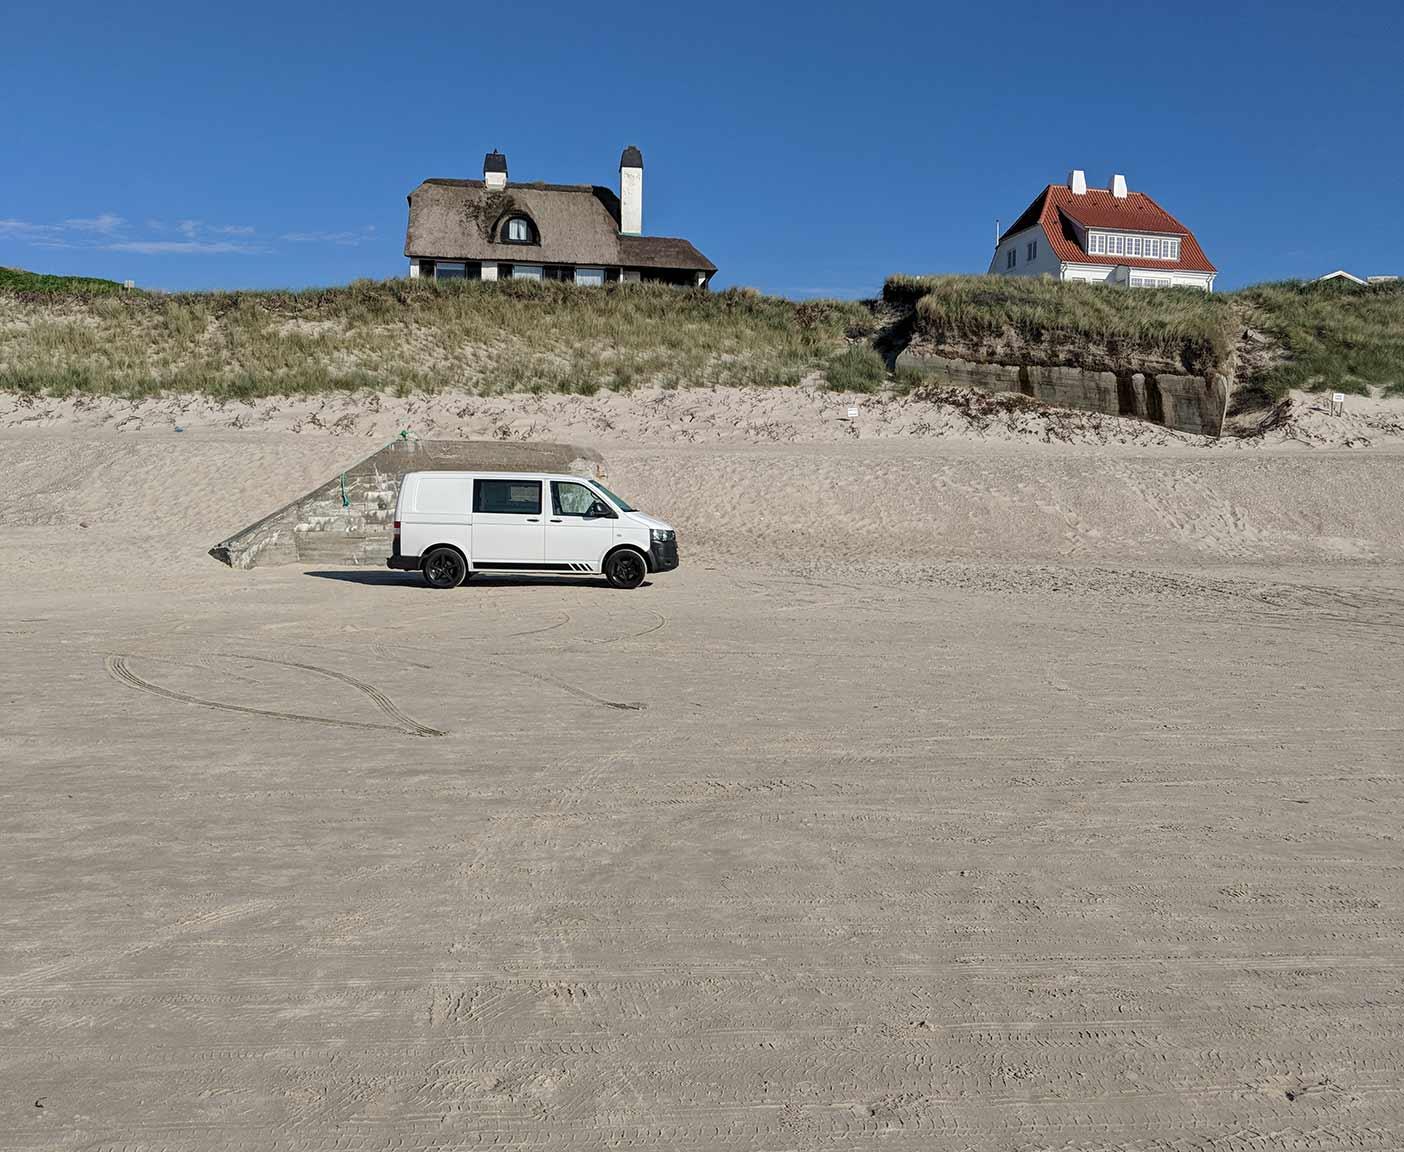 VW-T5-multivan-camper-caravelle-europatrip-van-strand-wild-campen